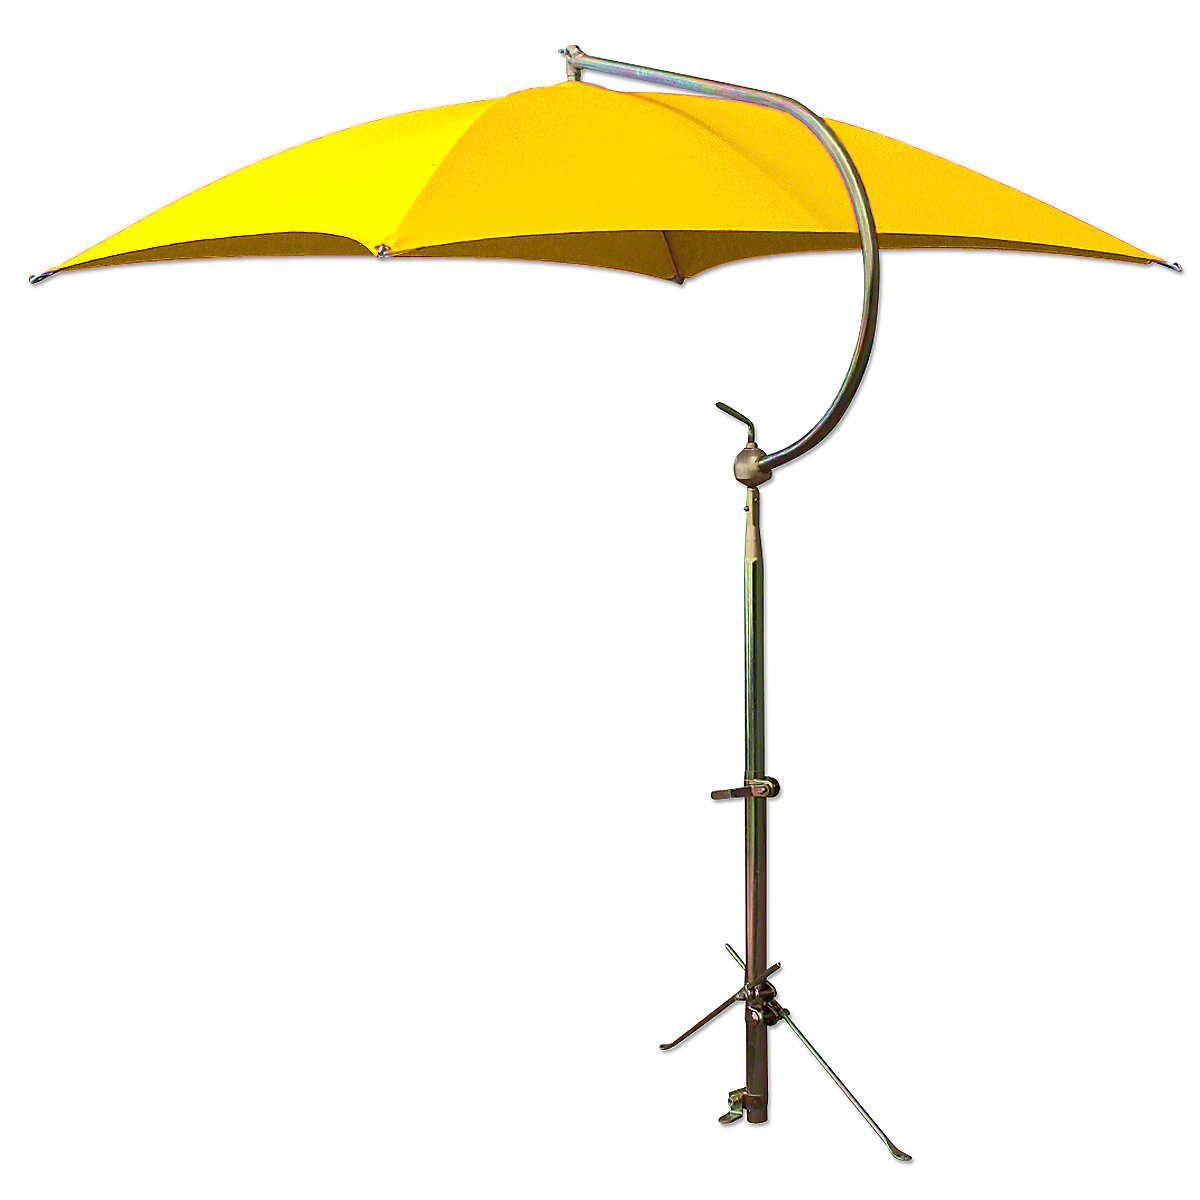 ABC2369Deluxe Yellow Umbrella with Brackets